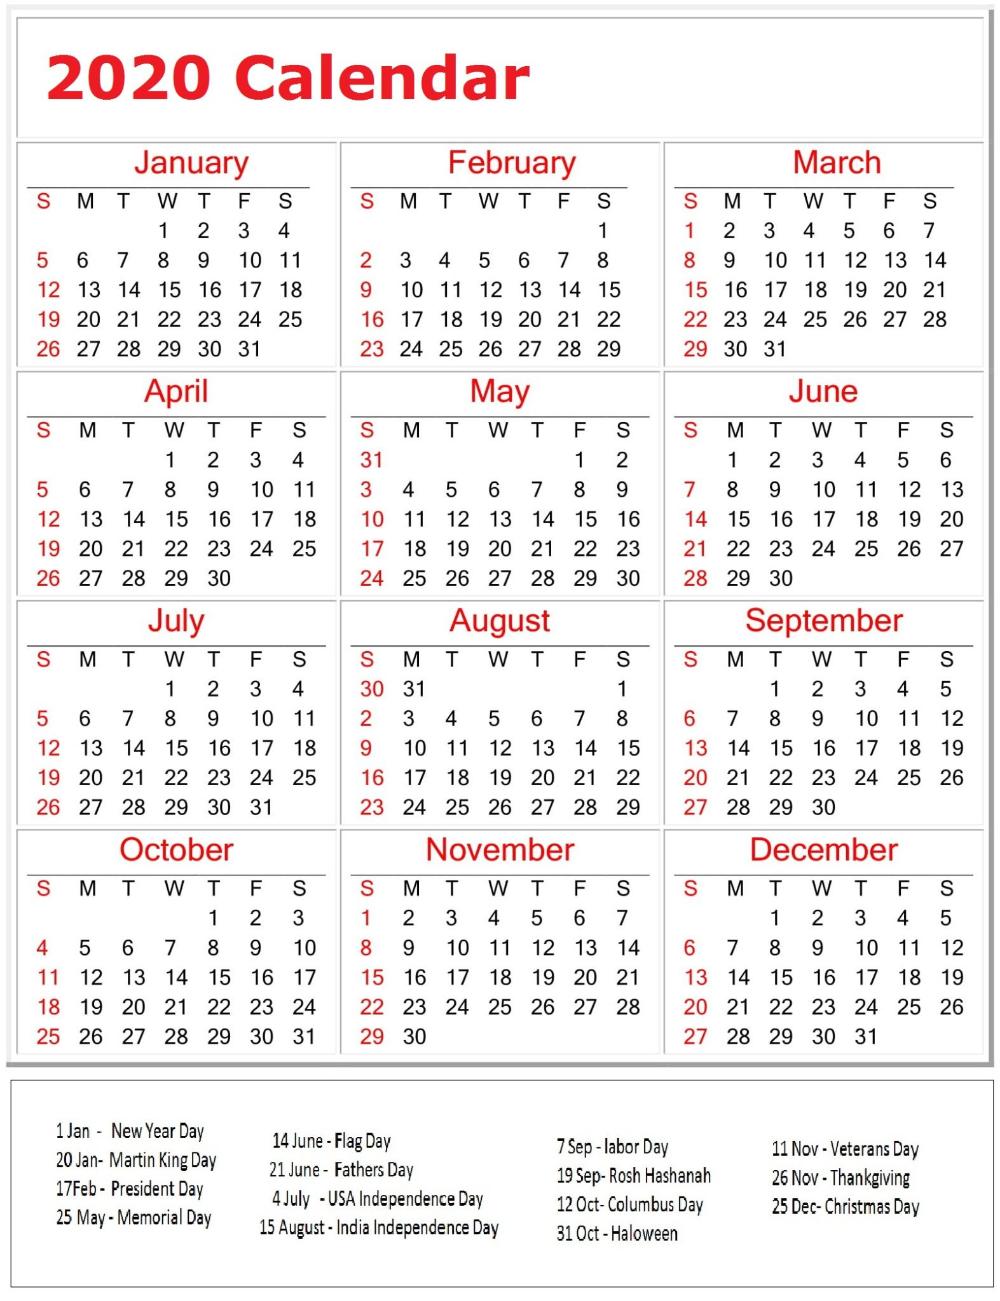 Printable 2020 Calendar With All American Holidays Holiday Printables Printable Calendar Pages Holiday Calender